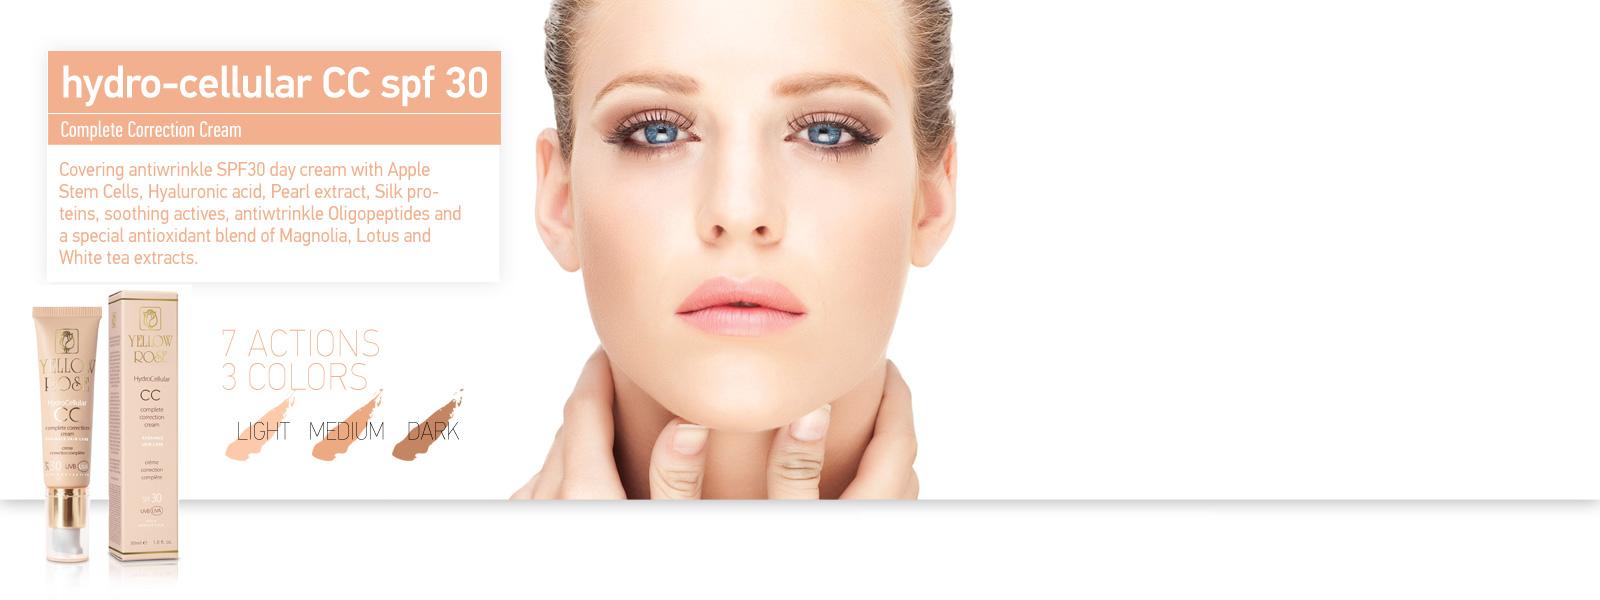 BP 5 acne